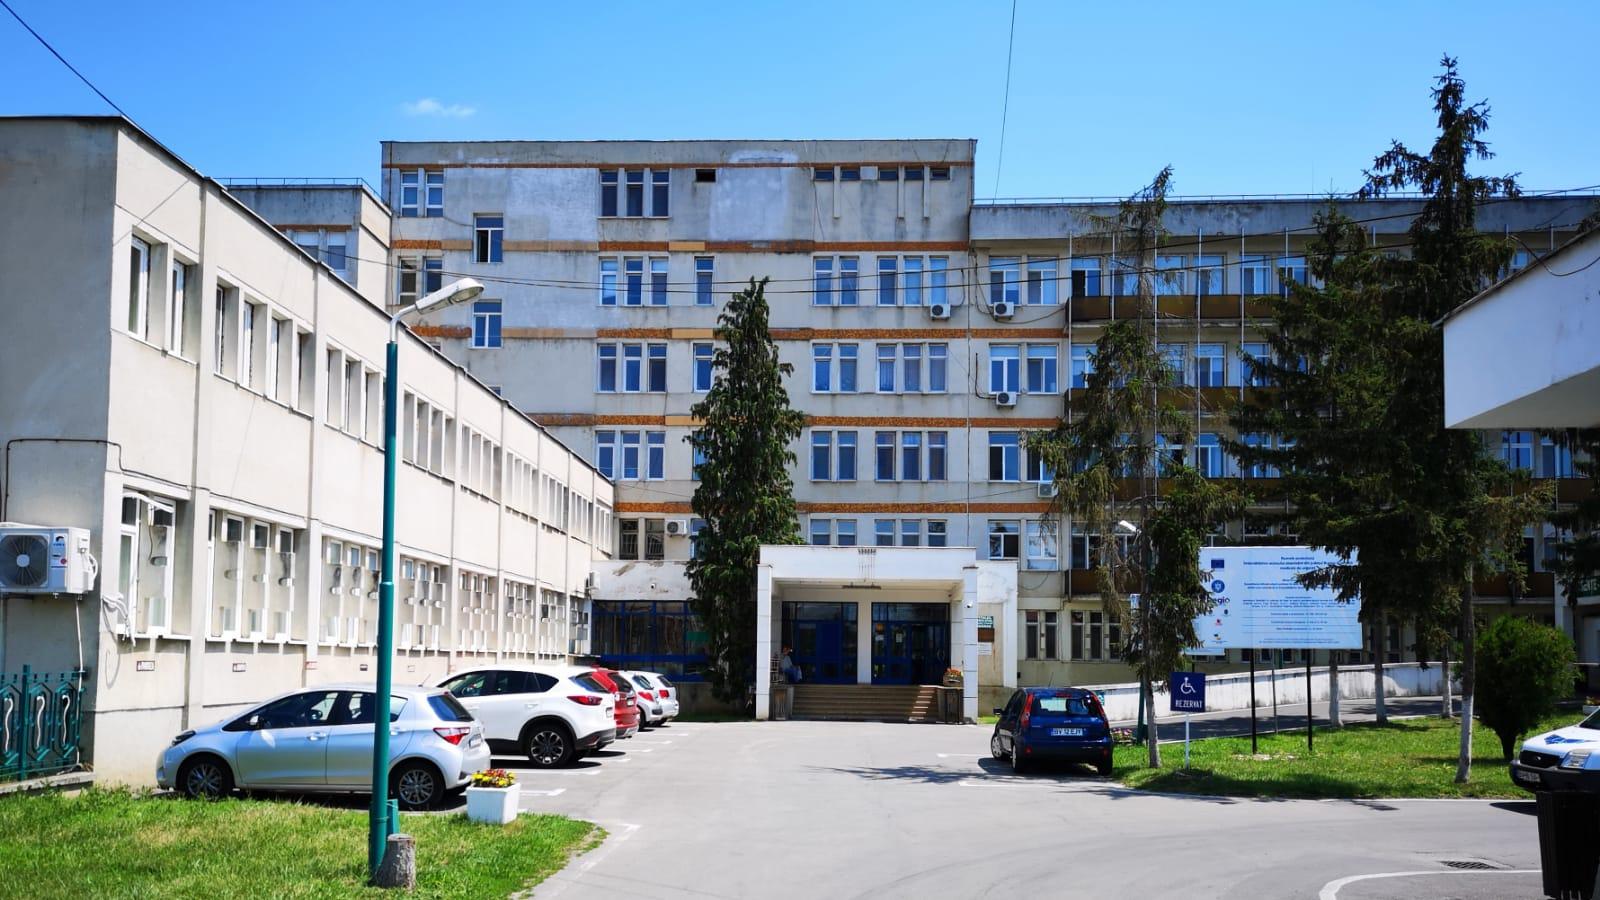 Programări online la Policlinica din Făgăraș